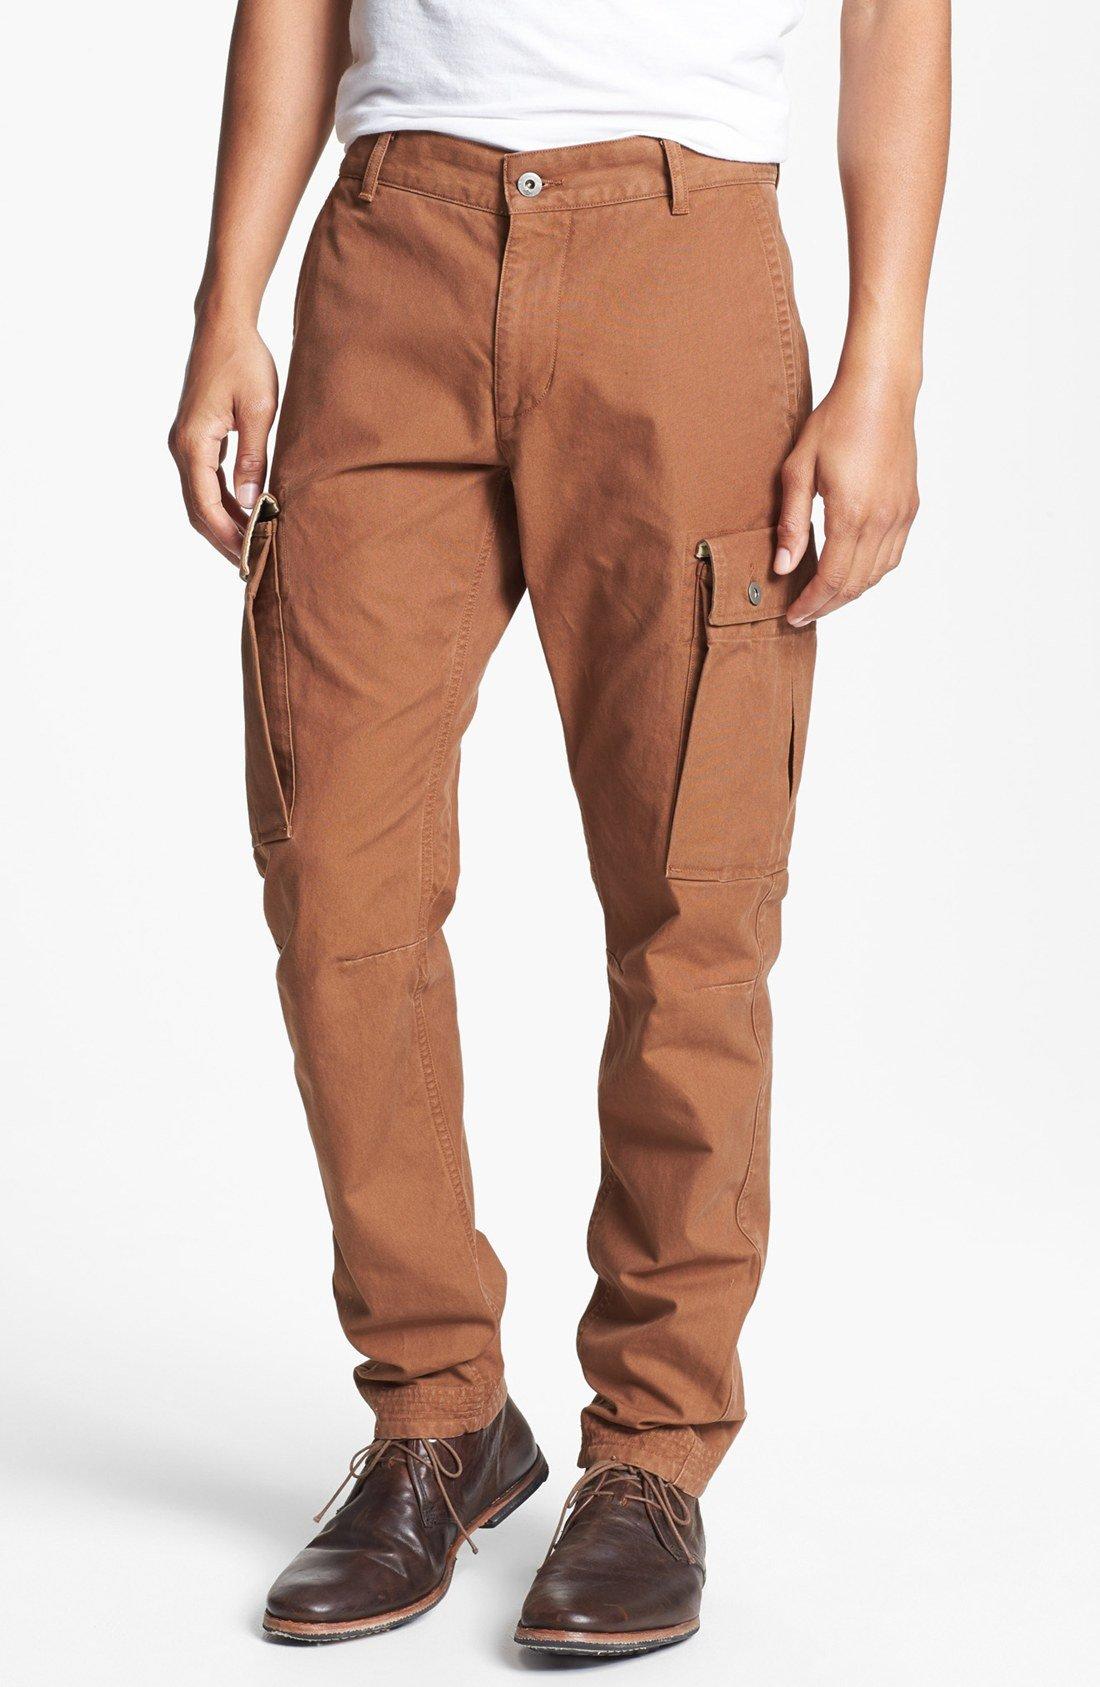 Awesome J Brand Womens Brown Maverick Slim Leg Zip Cargo Pocket Pants 25 $269 New | EBay